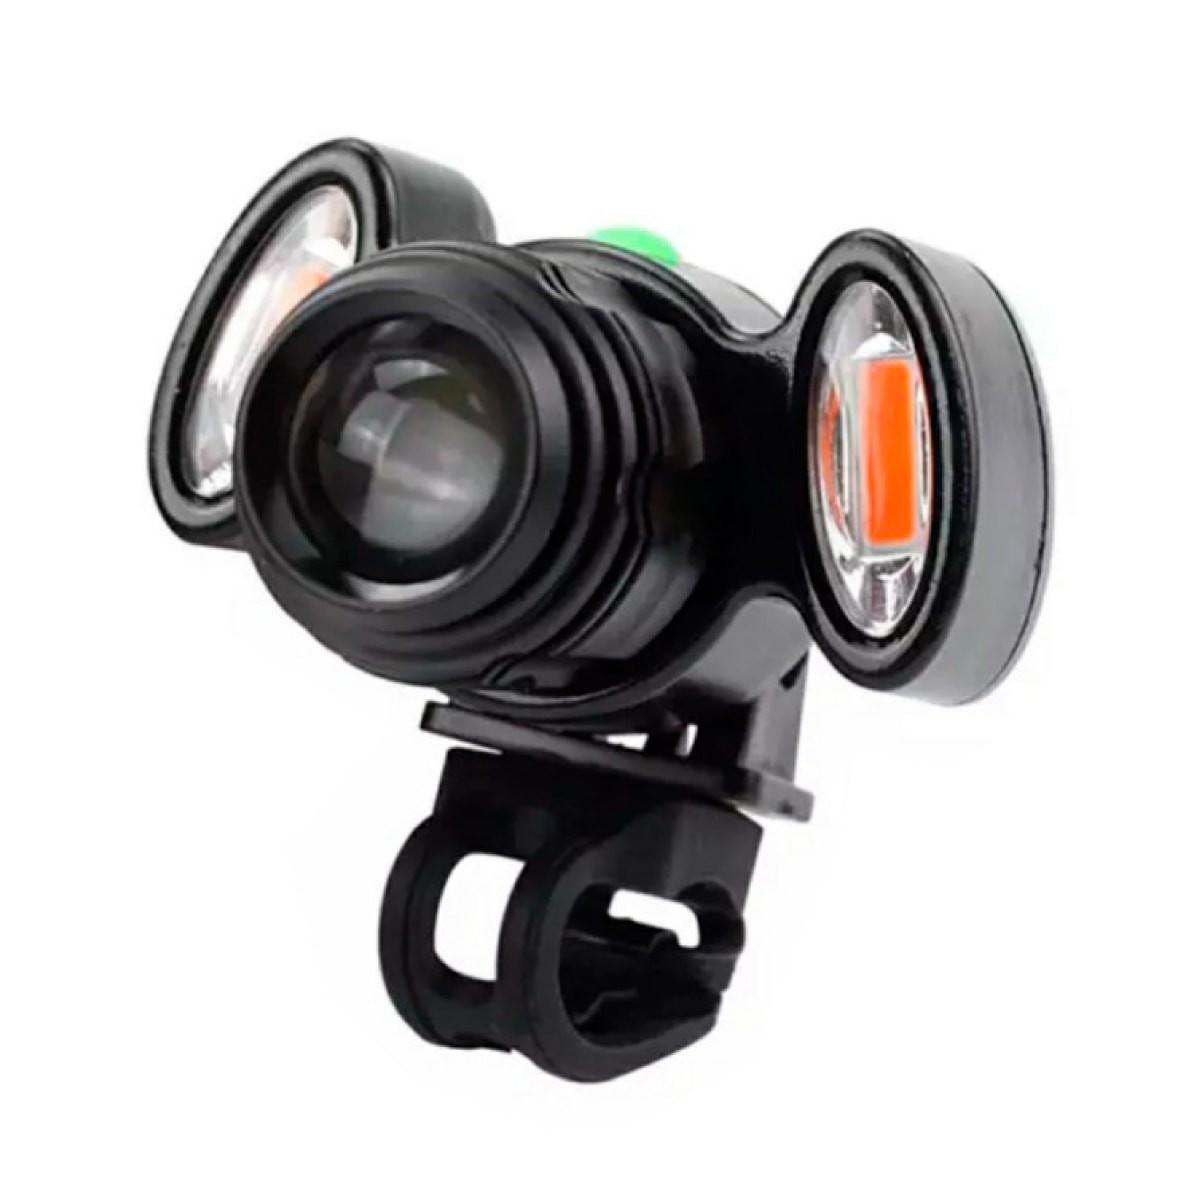 Farol USB 3 Lanterna Para cabeça Preto